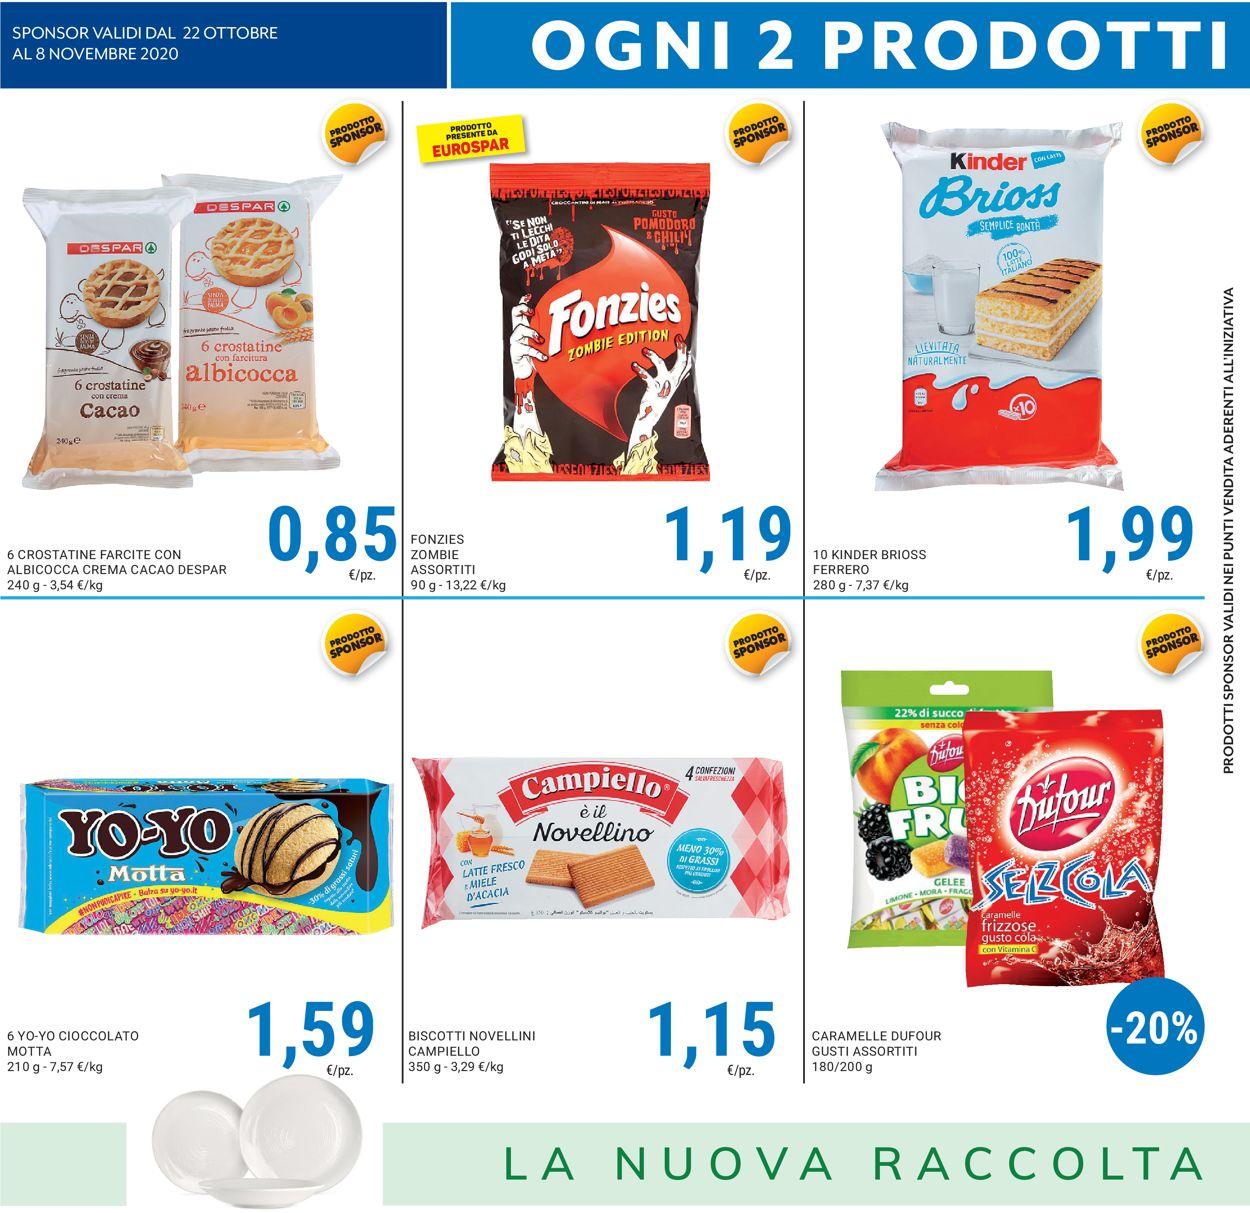 Volantino Interspar - Offerte 22/10-08/11/2020 (Pagina 6)